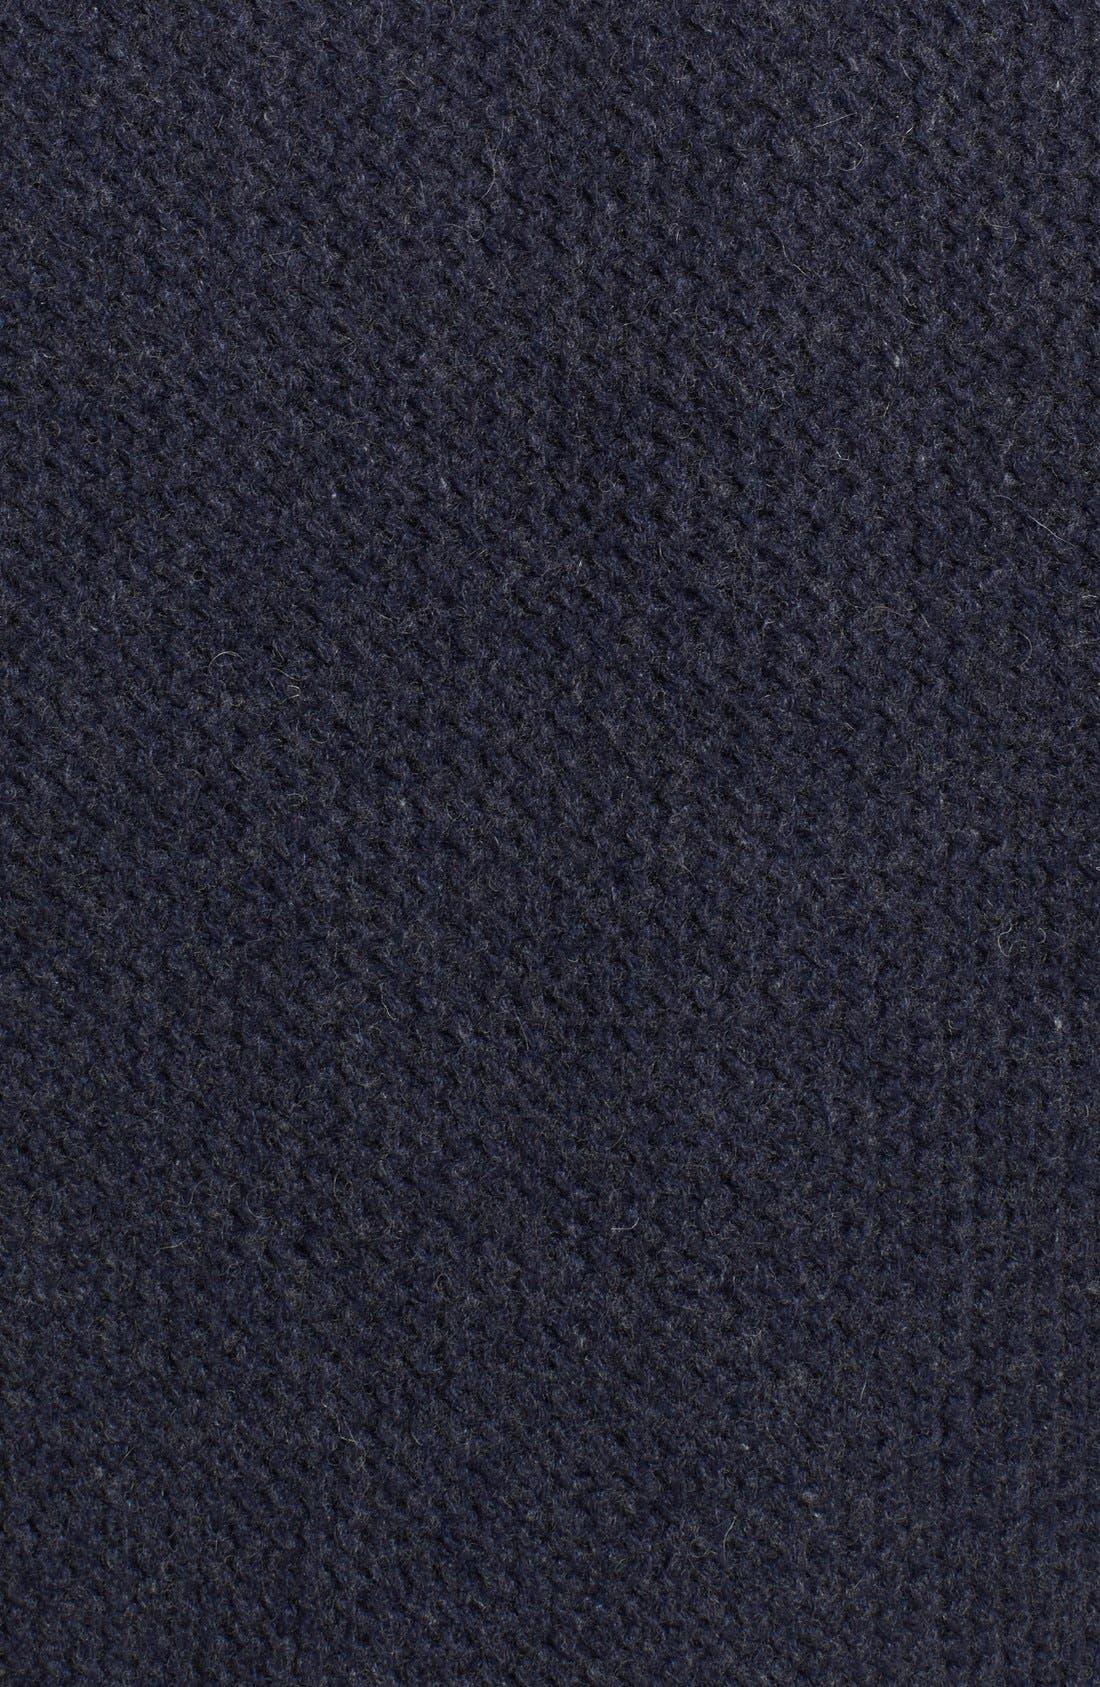 Regular Fit Shawl Collar Sweater,                             Alternate thumbnail 10, color,